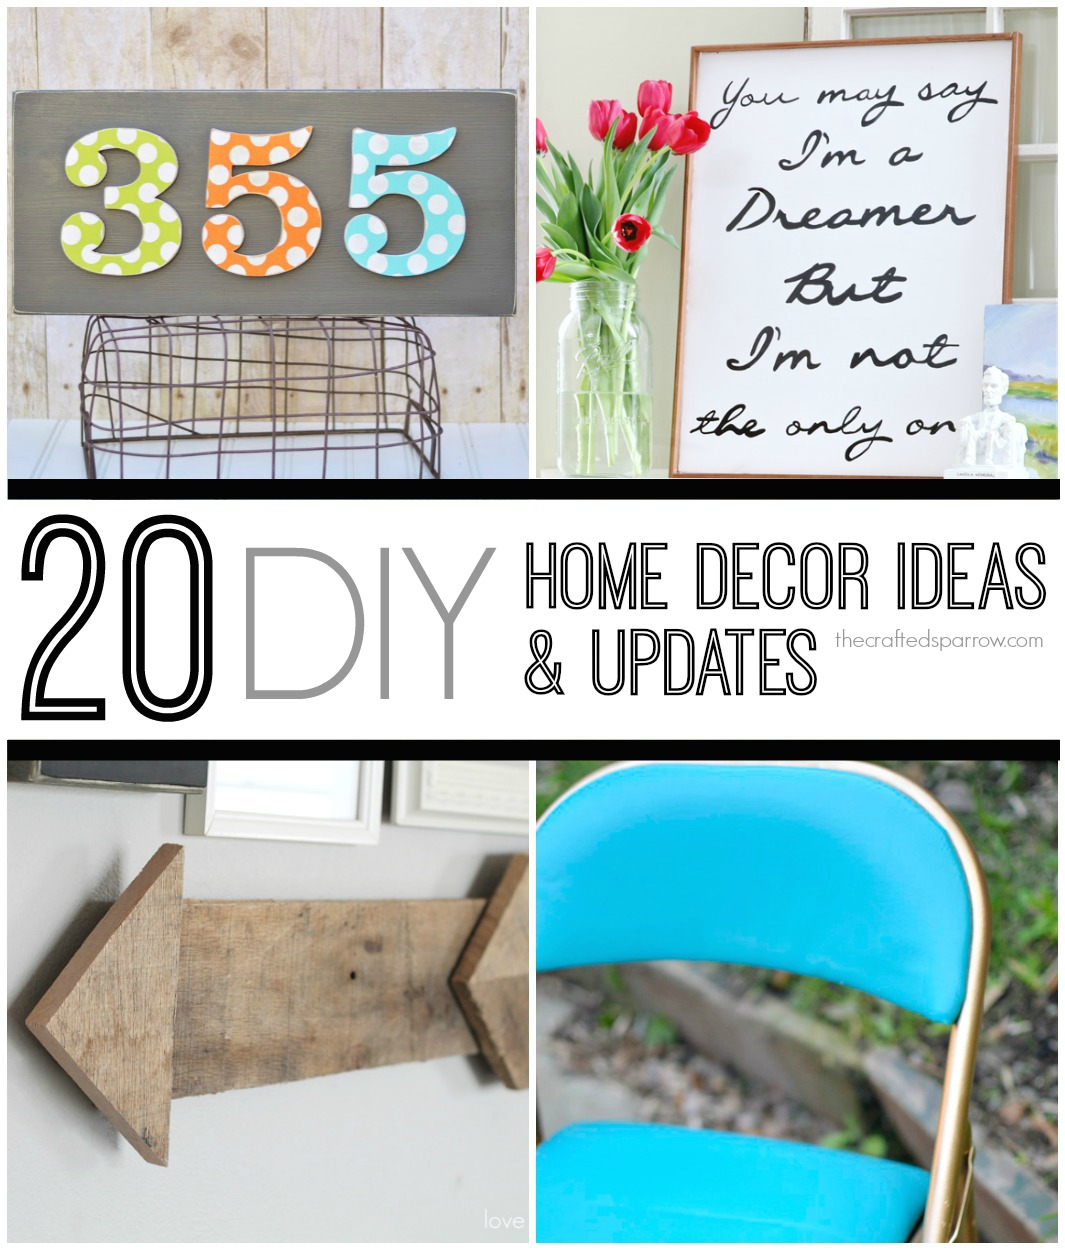 Diy Home Decor Instagram: 20 DIY Decor Ideas & Updates